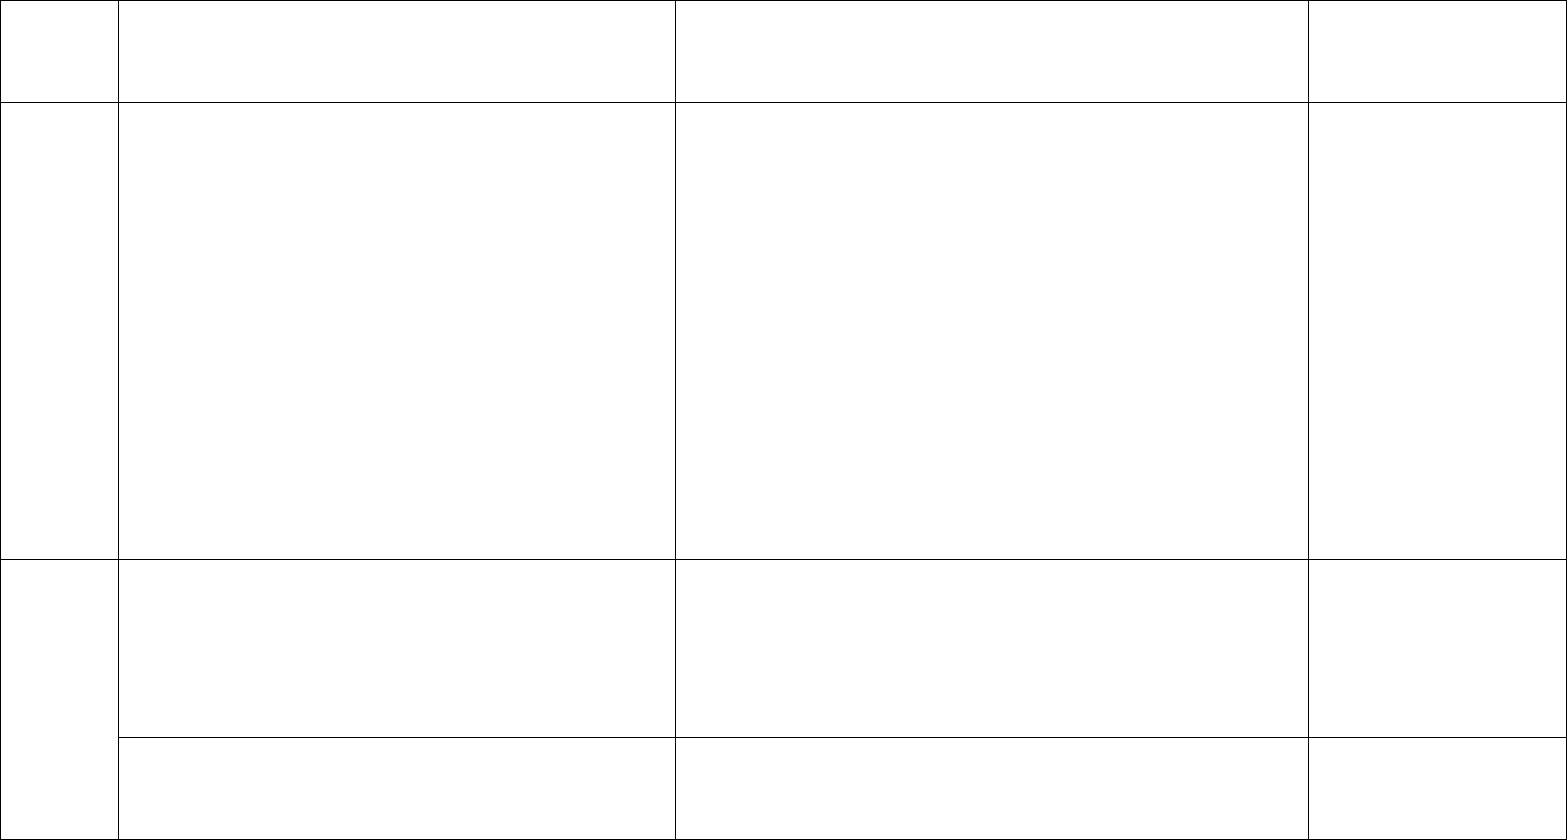 Download Rpt Sains Sukan Tingkatan 4 Bernilai Rpt Prinsip Perakaunan Ting 4 2015 Pdf Document Of Download Rpt Sains Sukan Tingkatan 4 Yang Dapat Di Cetak Dengan Senang